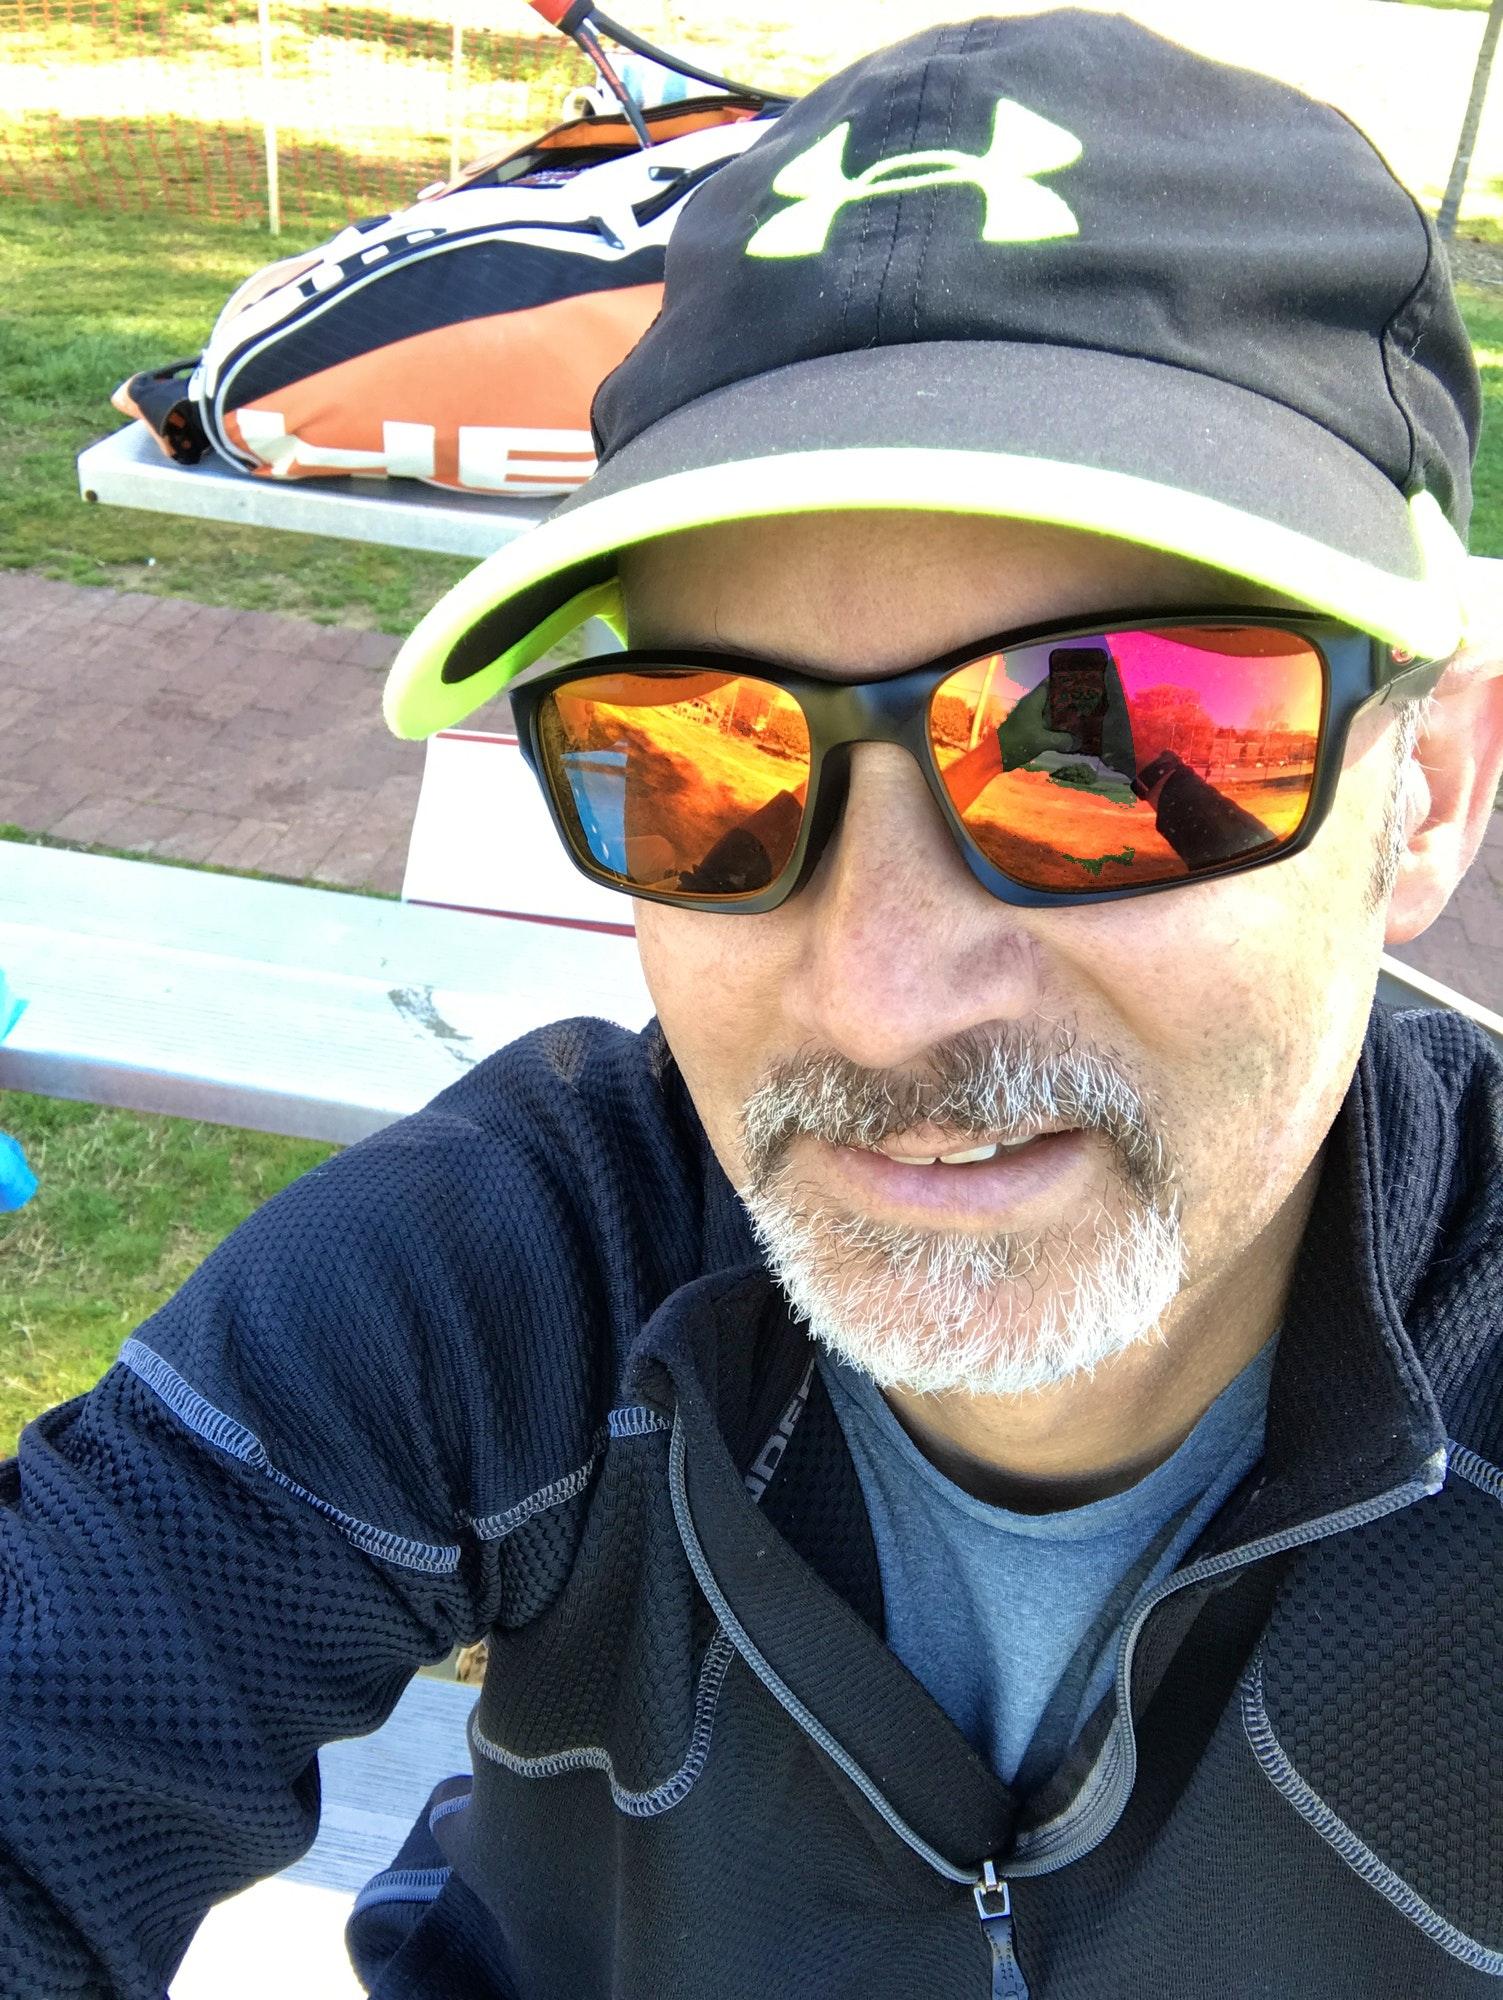 Brent B. teaches tennis lessons in South Riding, VA